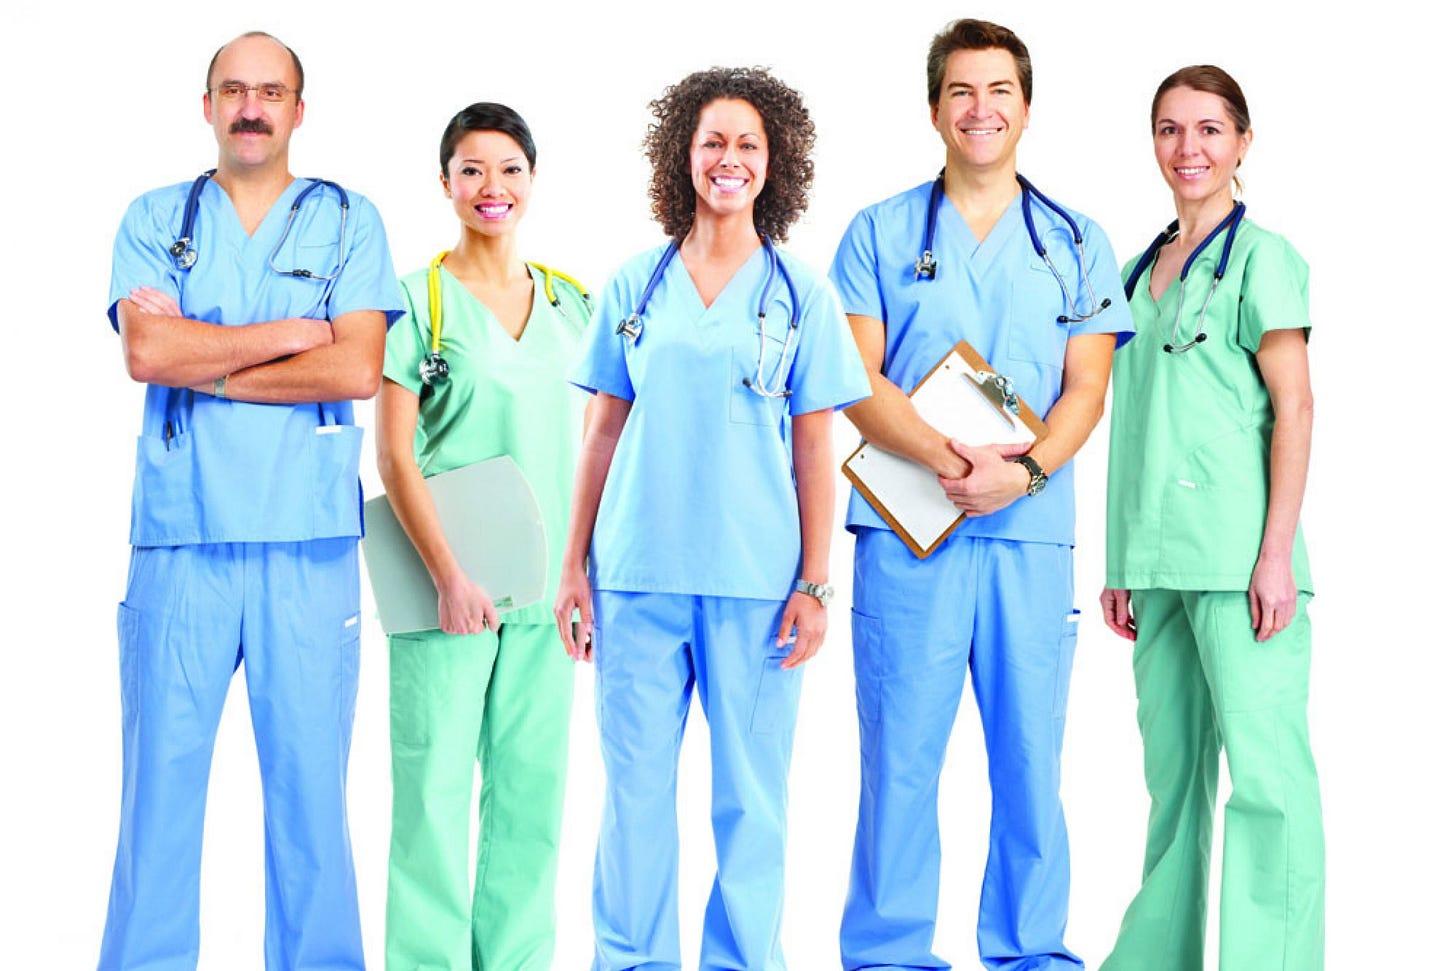 National Workforce Statistics Shed Light on Today's Nursing Industry |  Salute to Nurses - Noozhawk.com